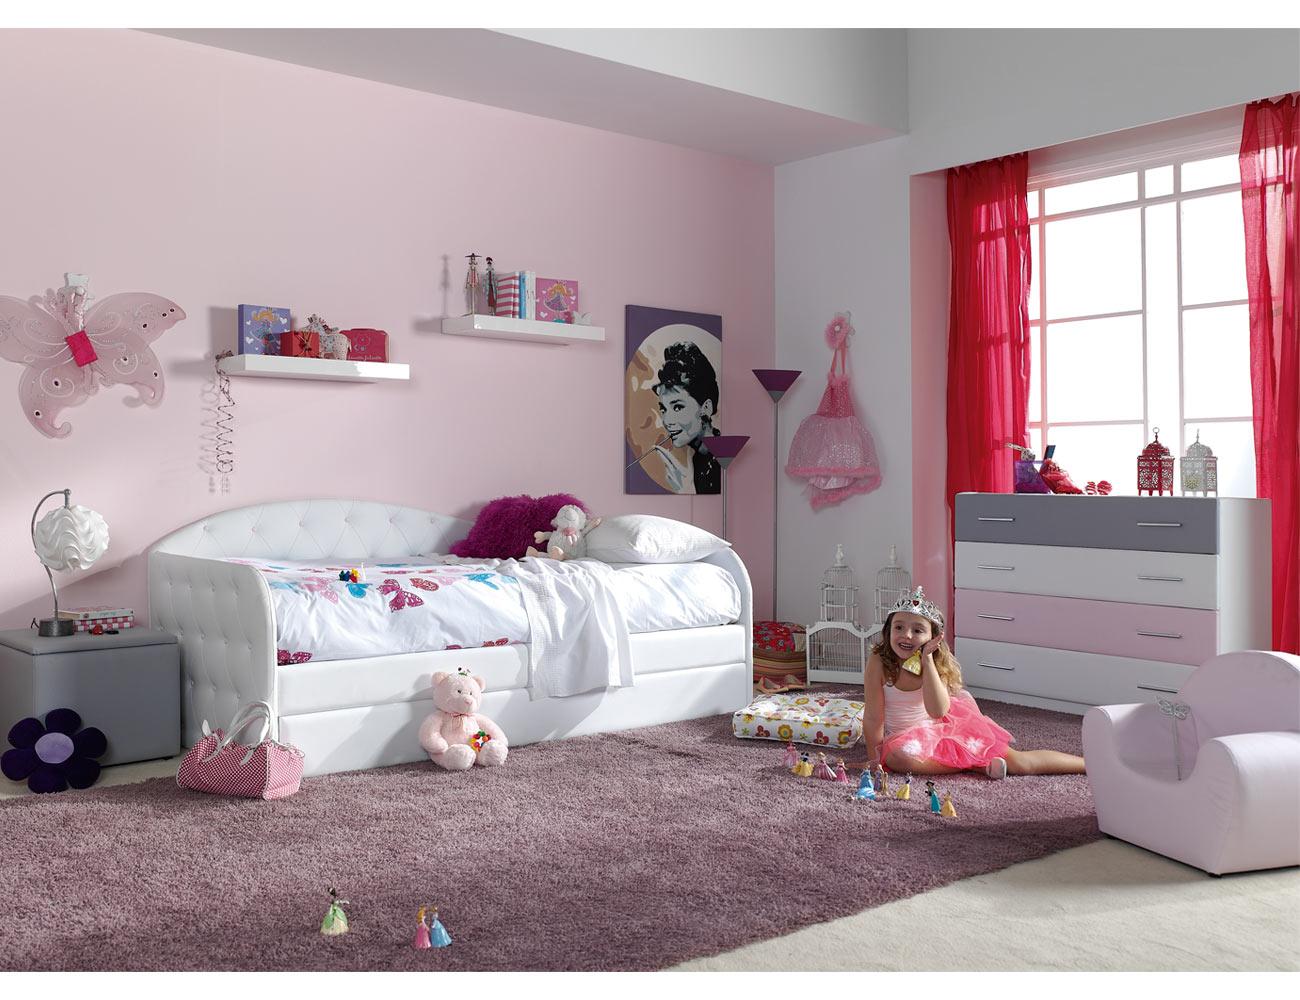 243 cama nido4